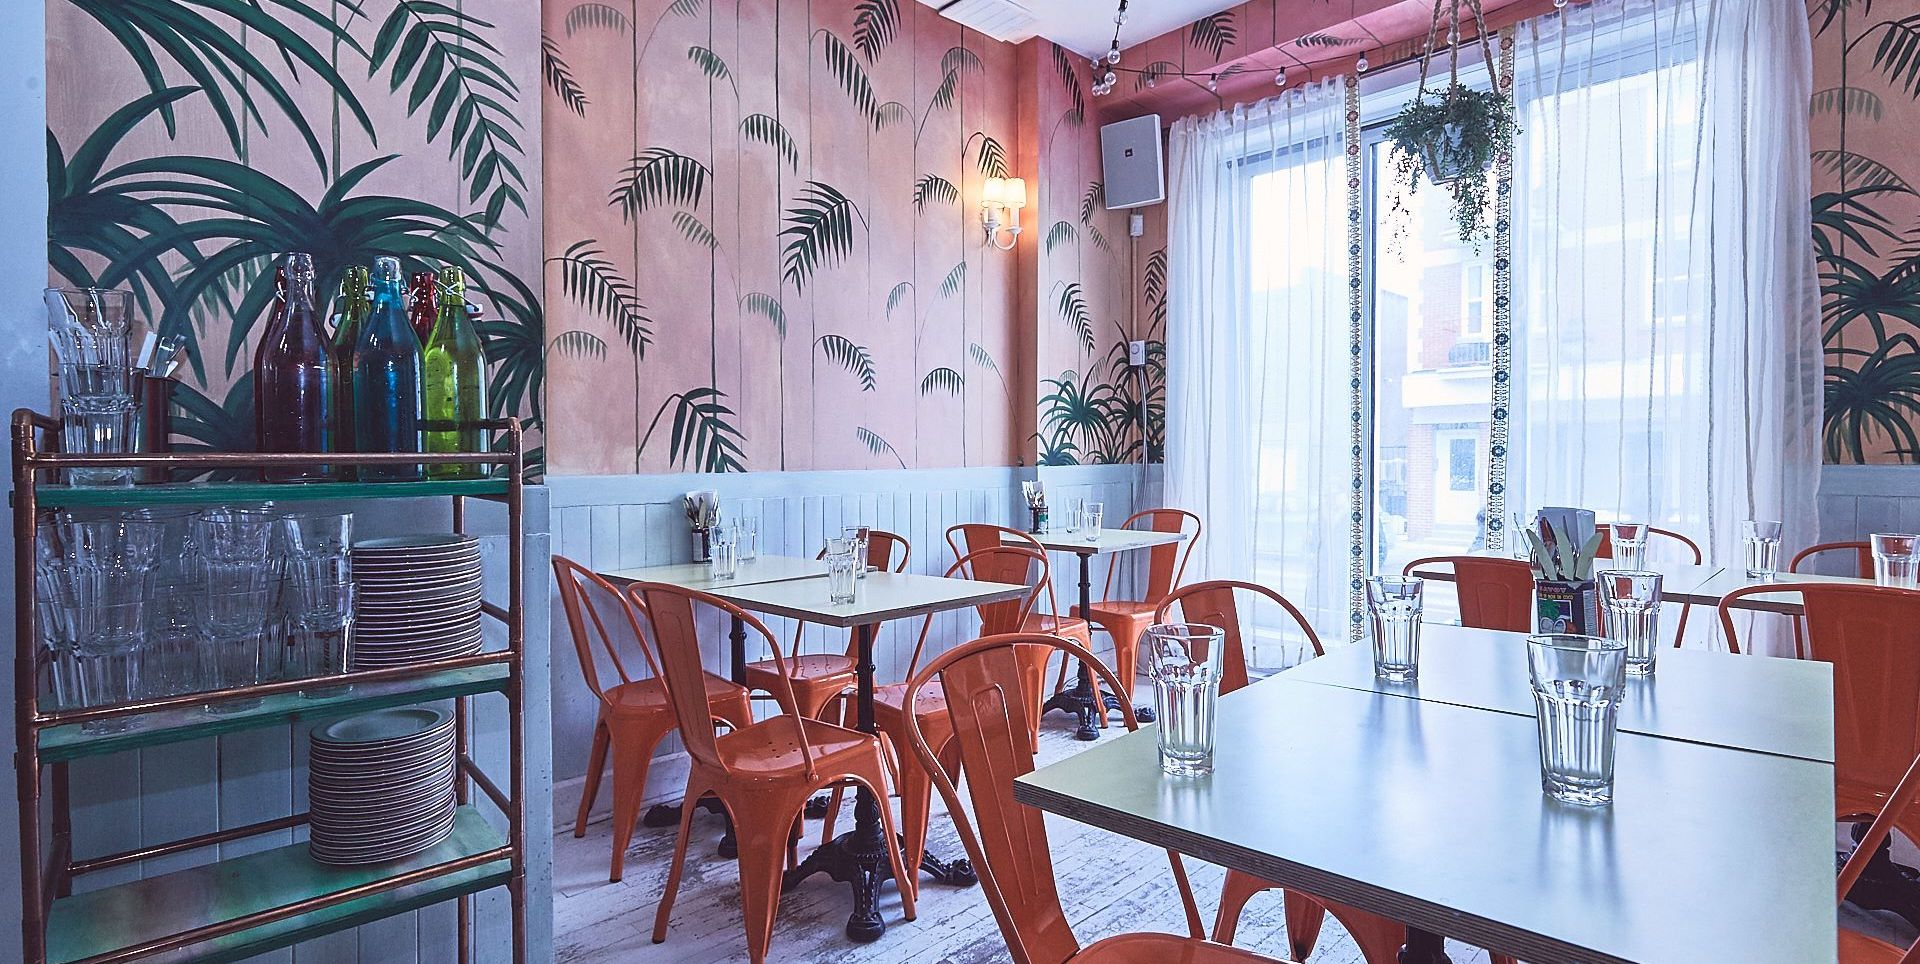 Most Instagrammable Restaurants In Canada